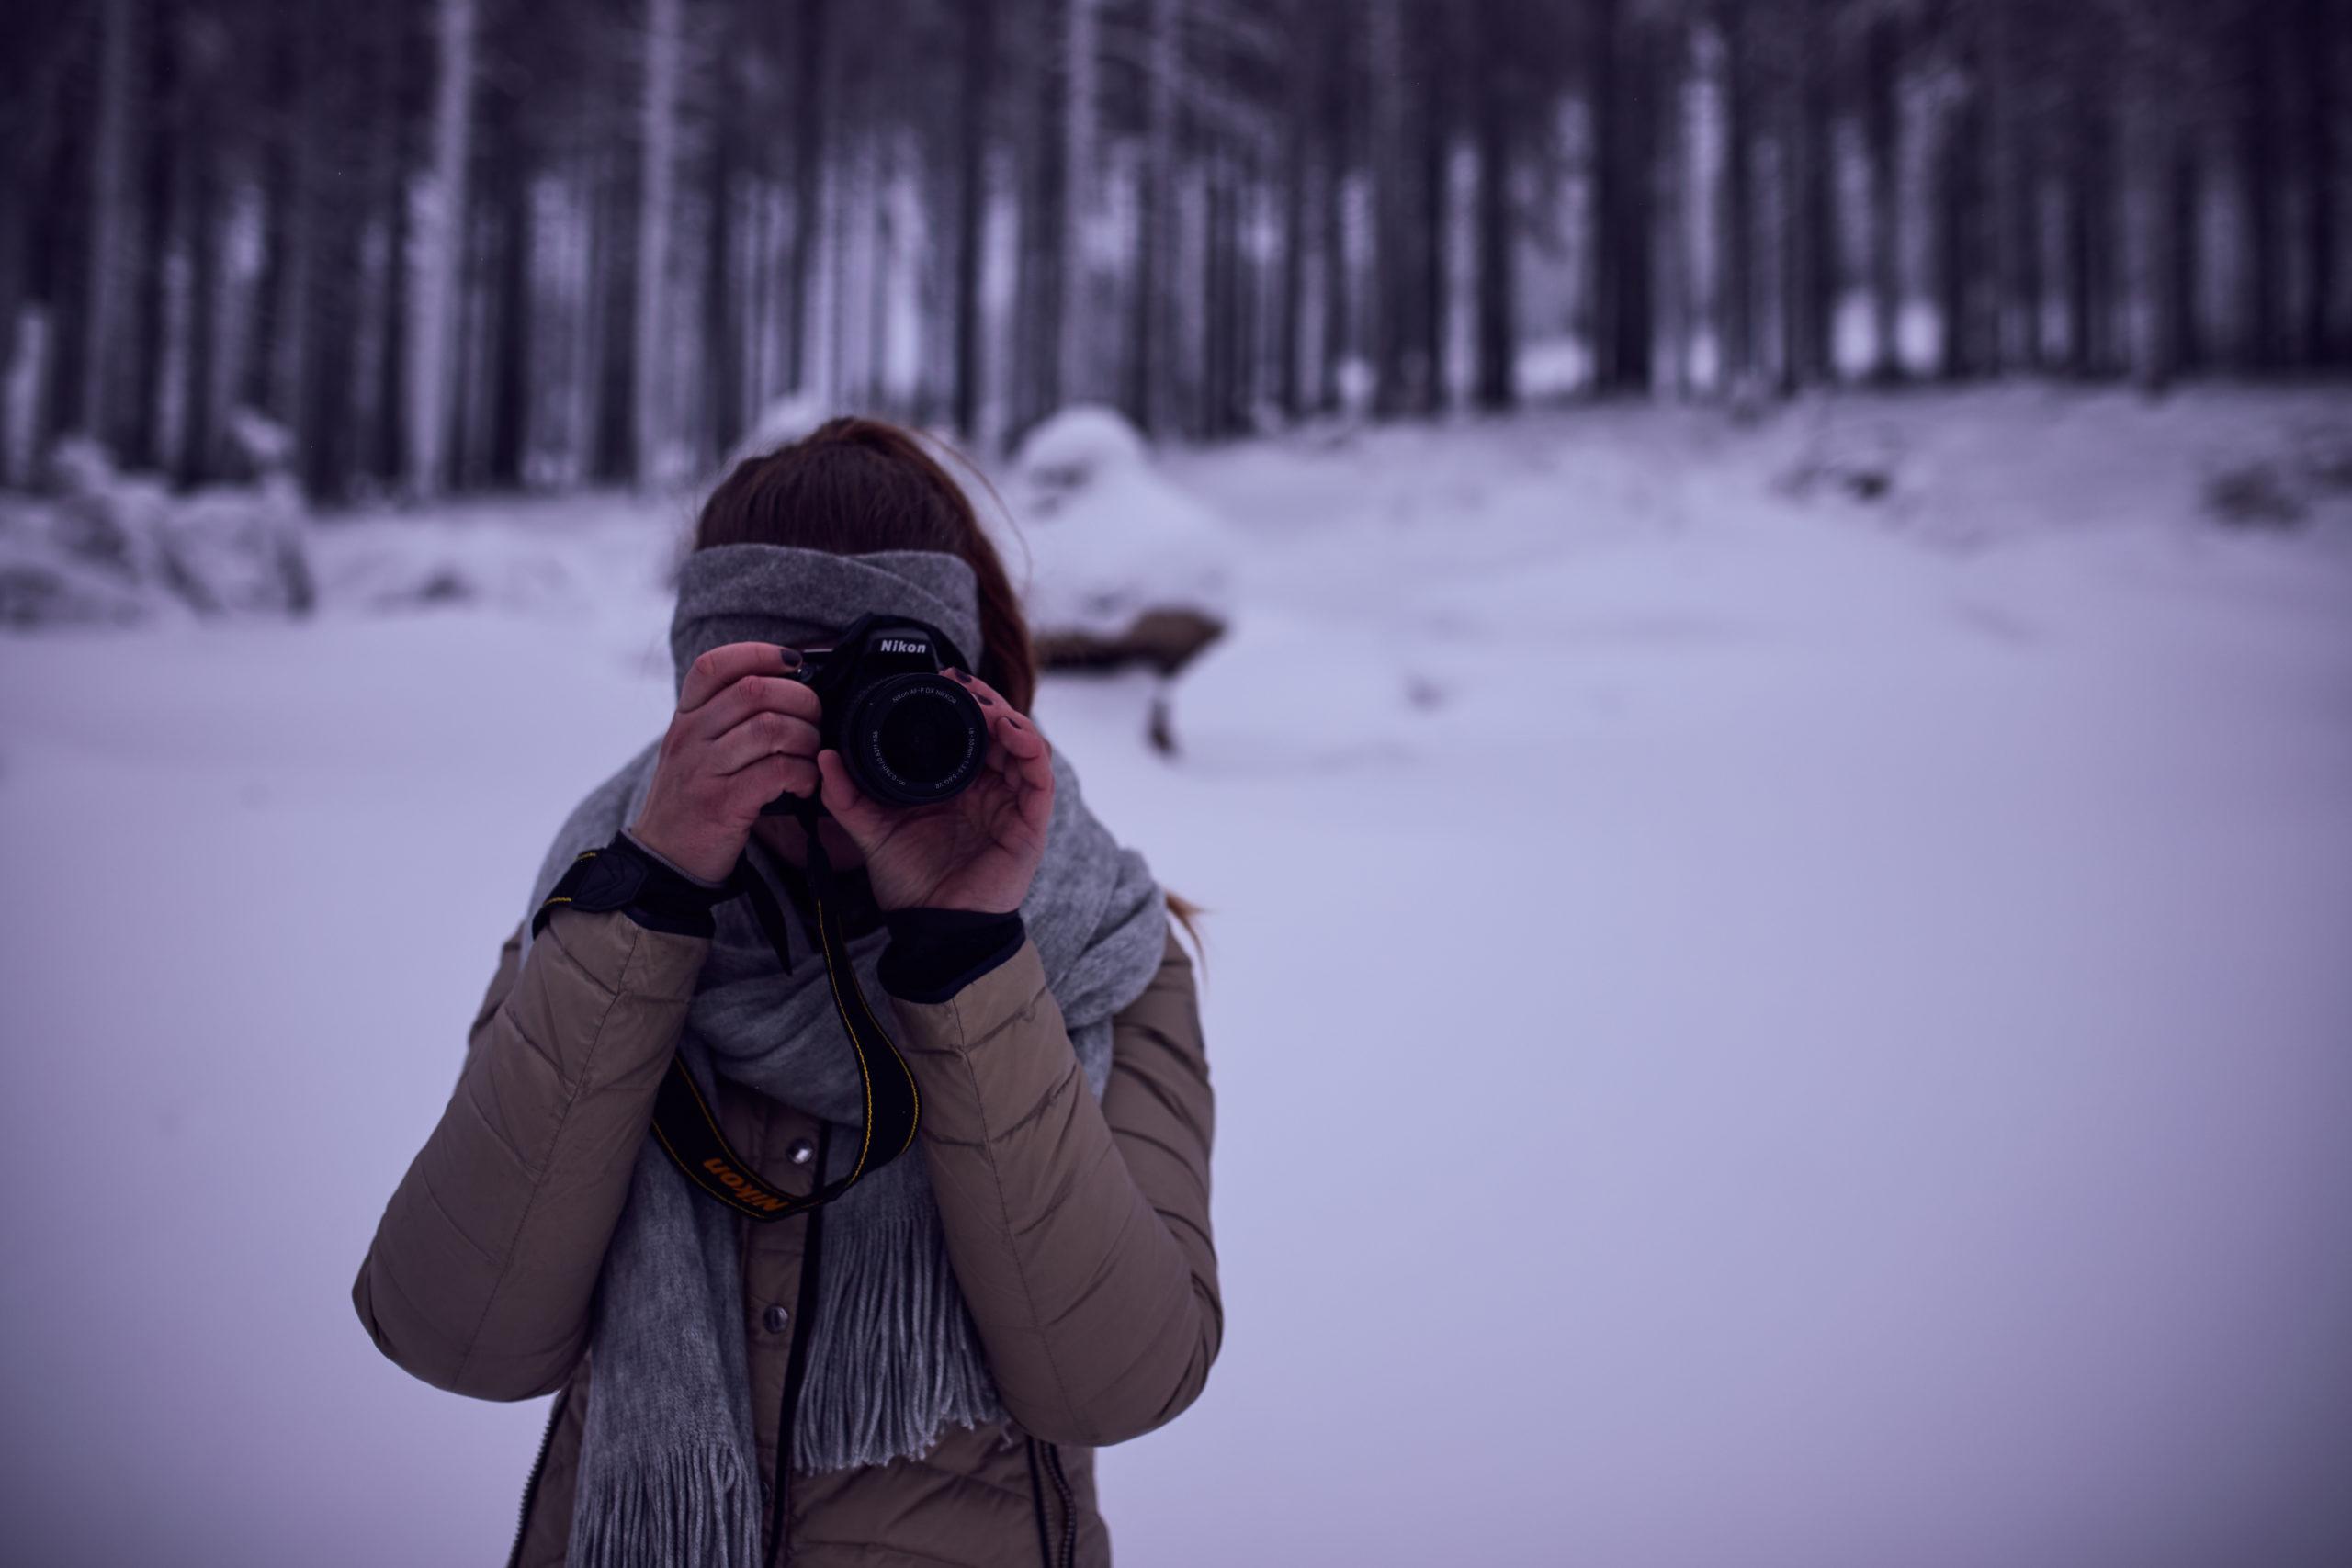 she wanders - Presse & Partnerschaften auf dem Harz Blog